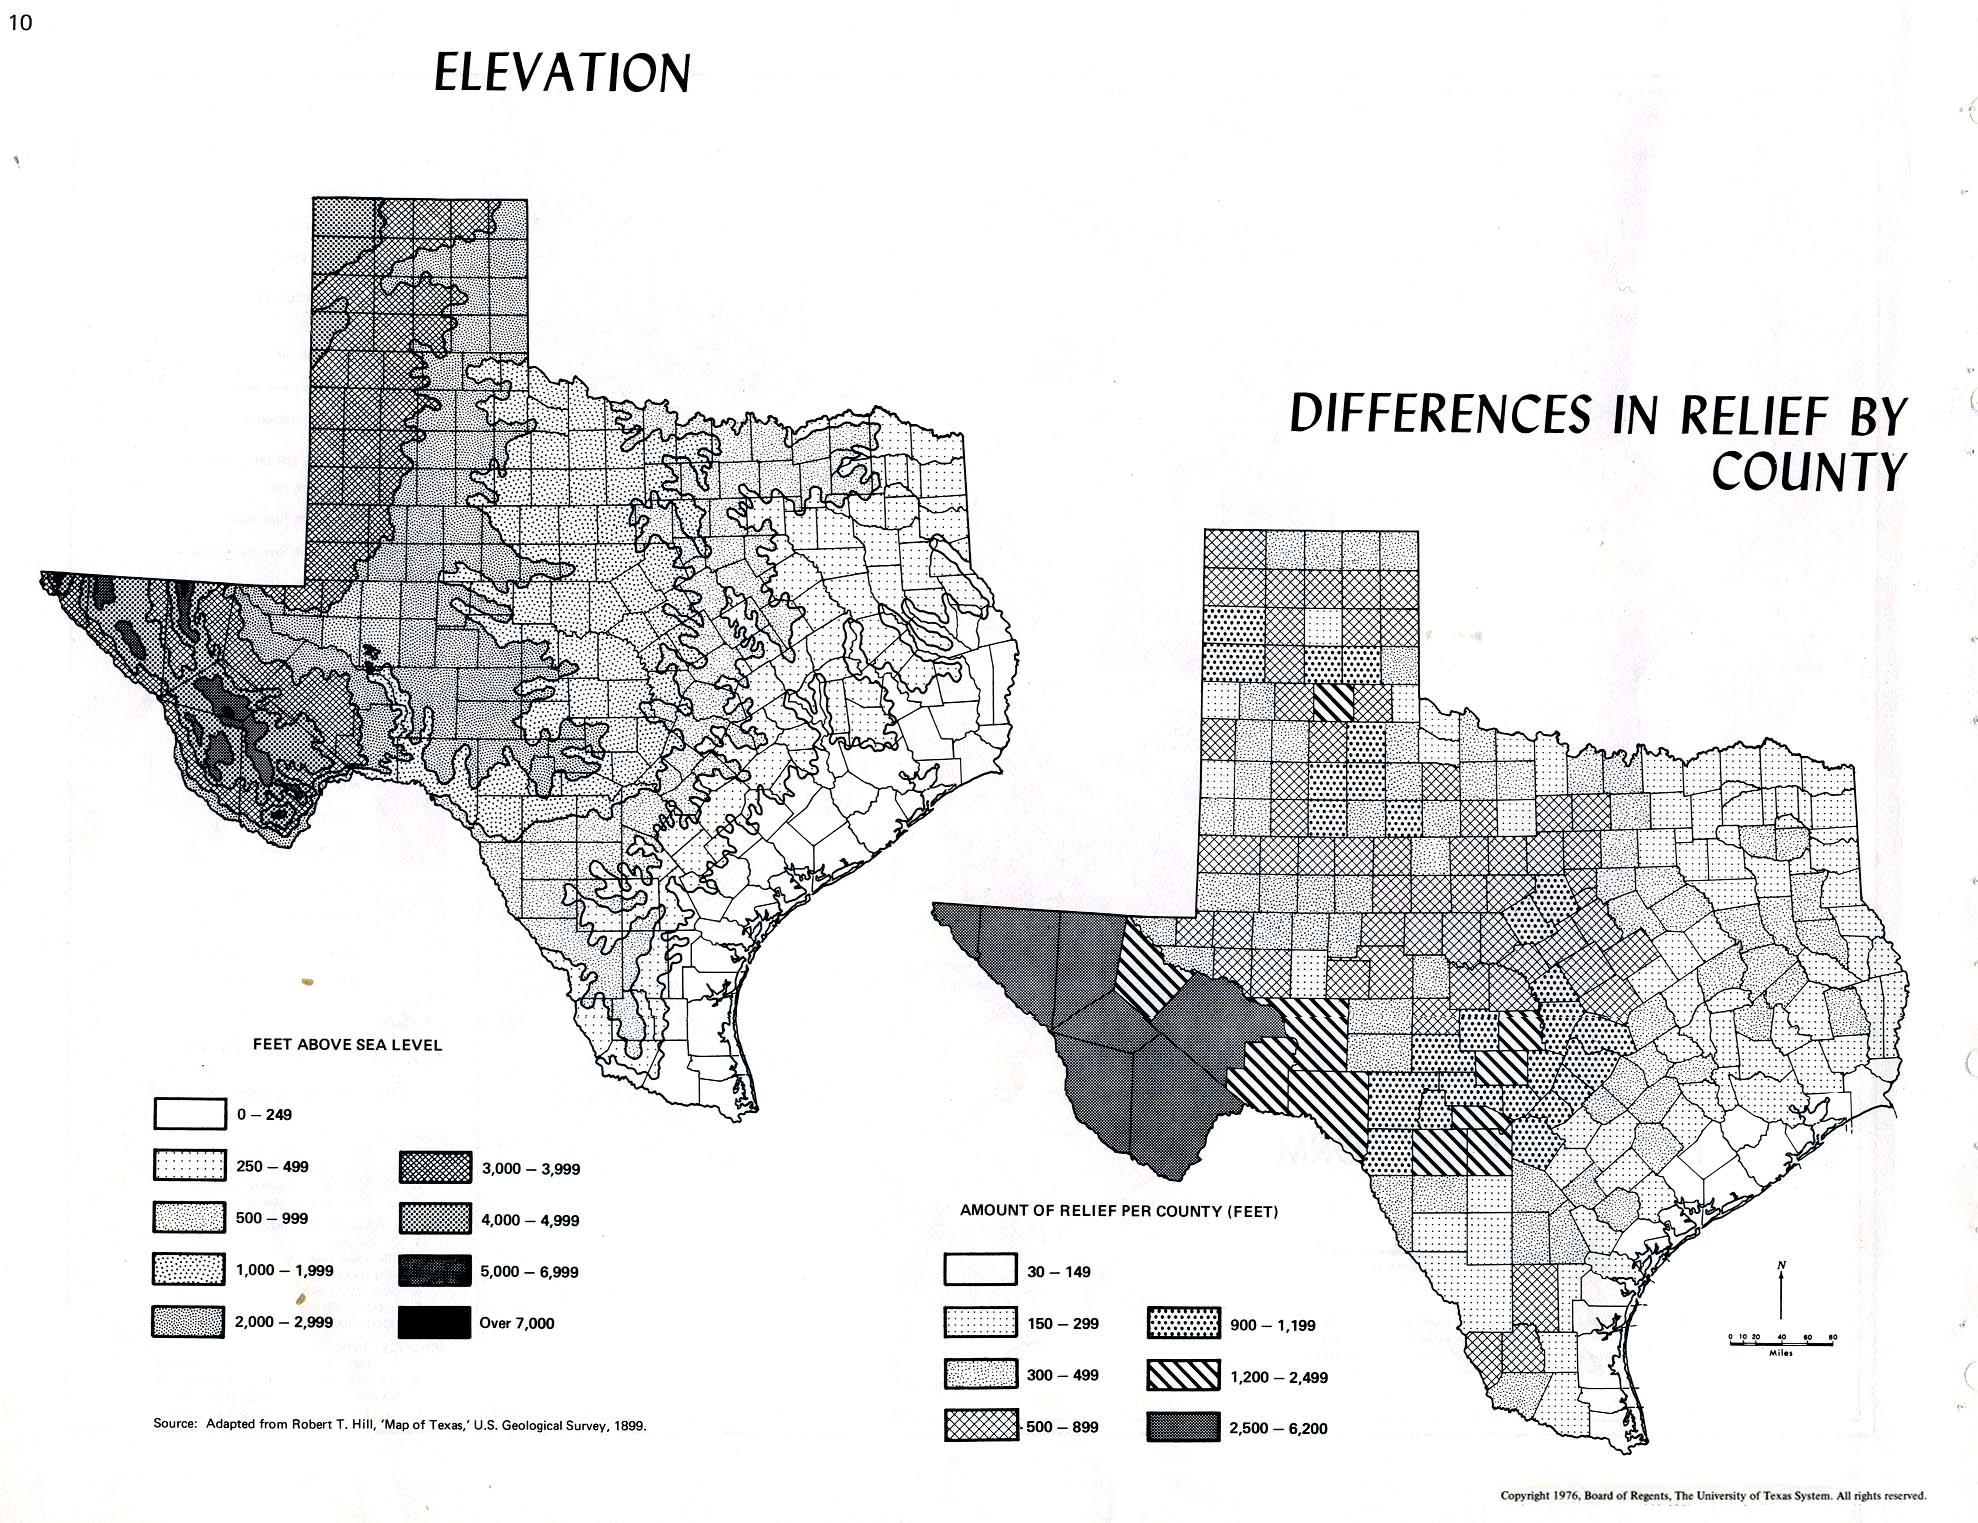 Atlas Of Texas PerryCastañeda Map Collection UT Library Online - Texas elevation map